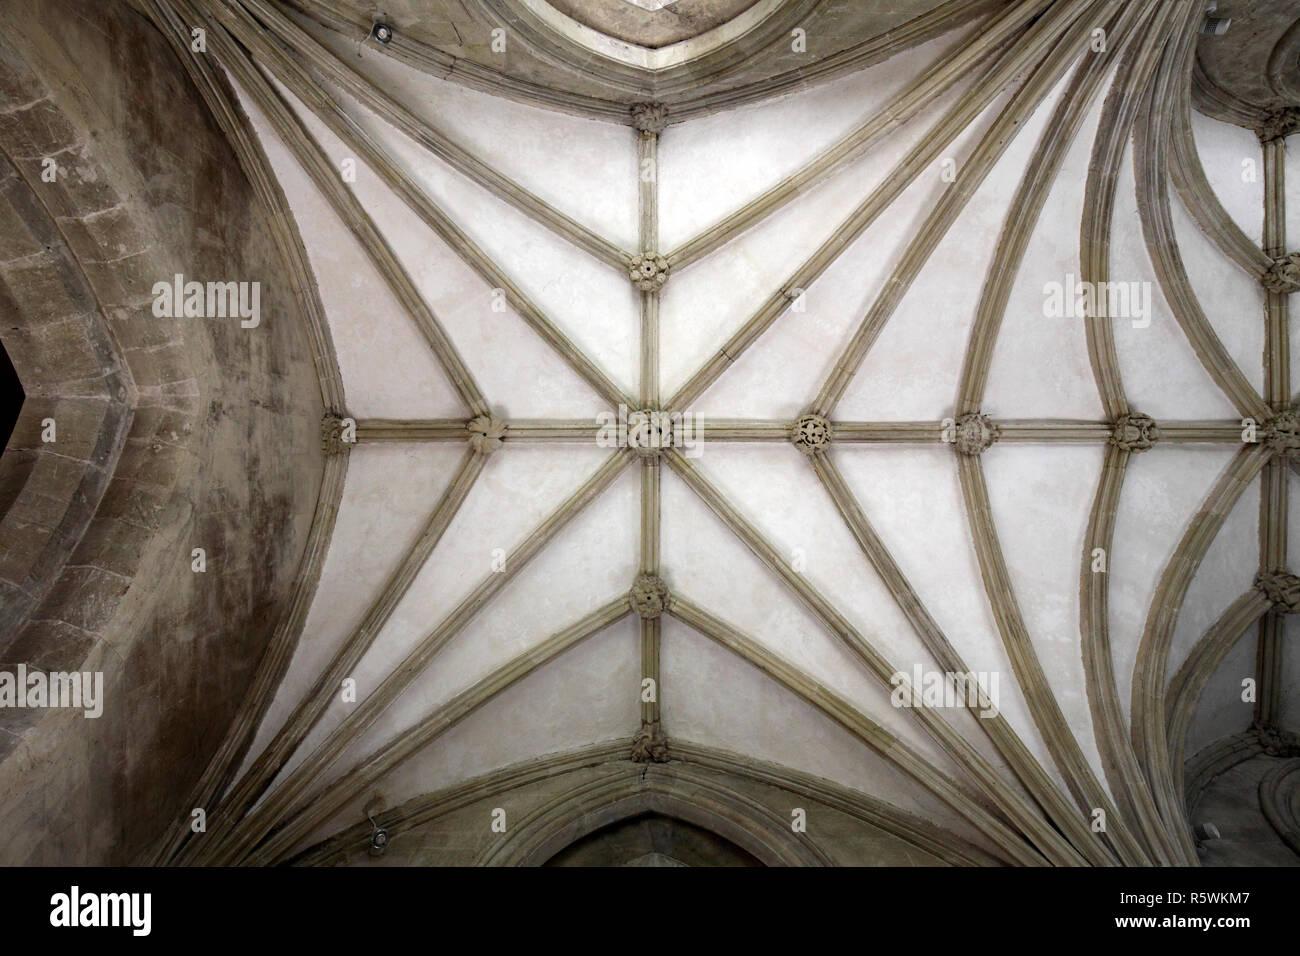 Stone church roof bracers and bosses. Stone vaulting ribs. St John the Baptist parish church, Bishopstone, Wiltshire. Stock Photo